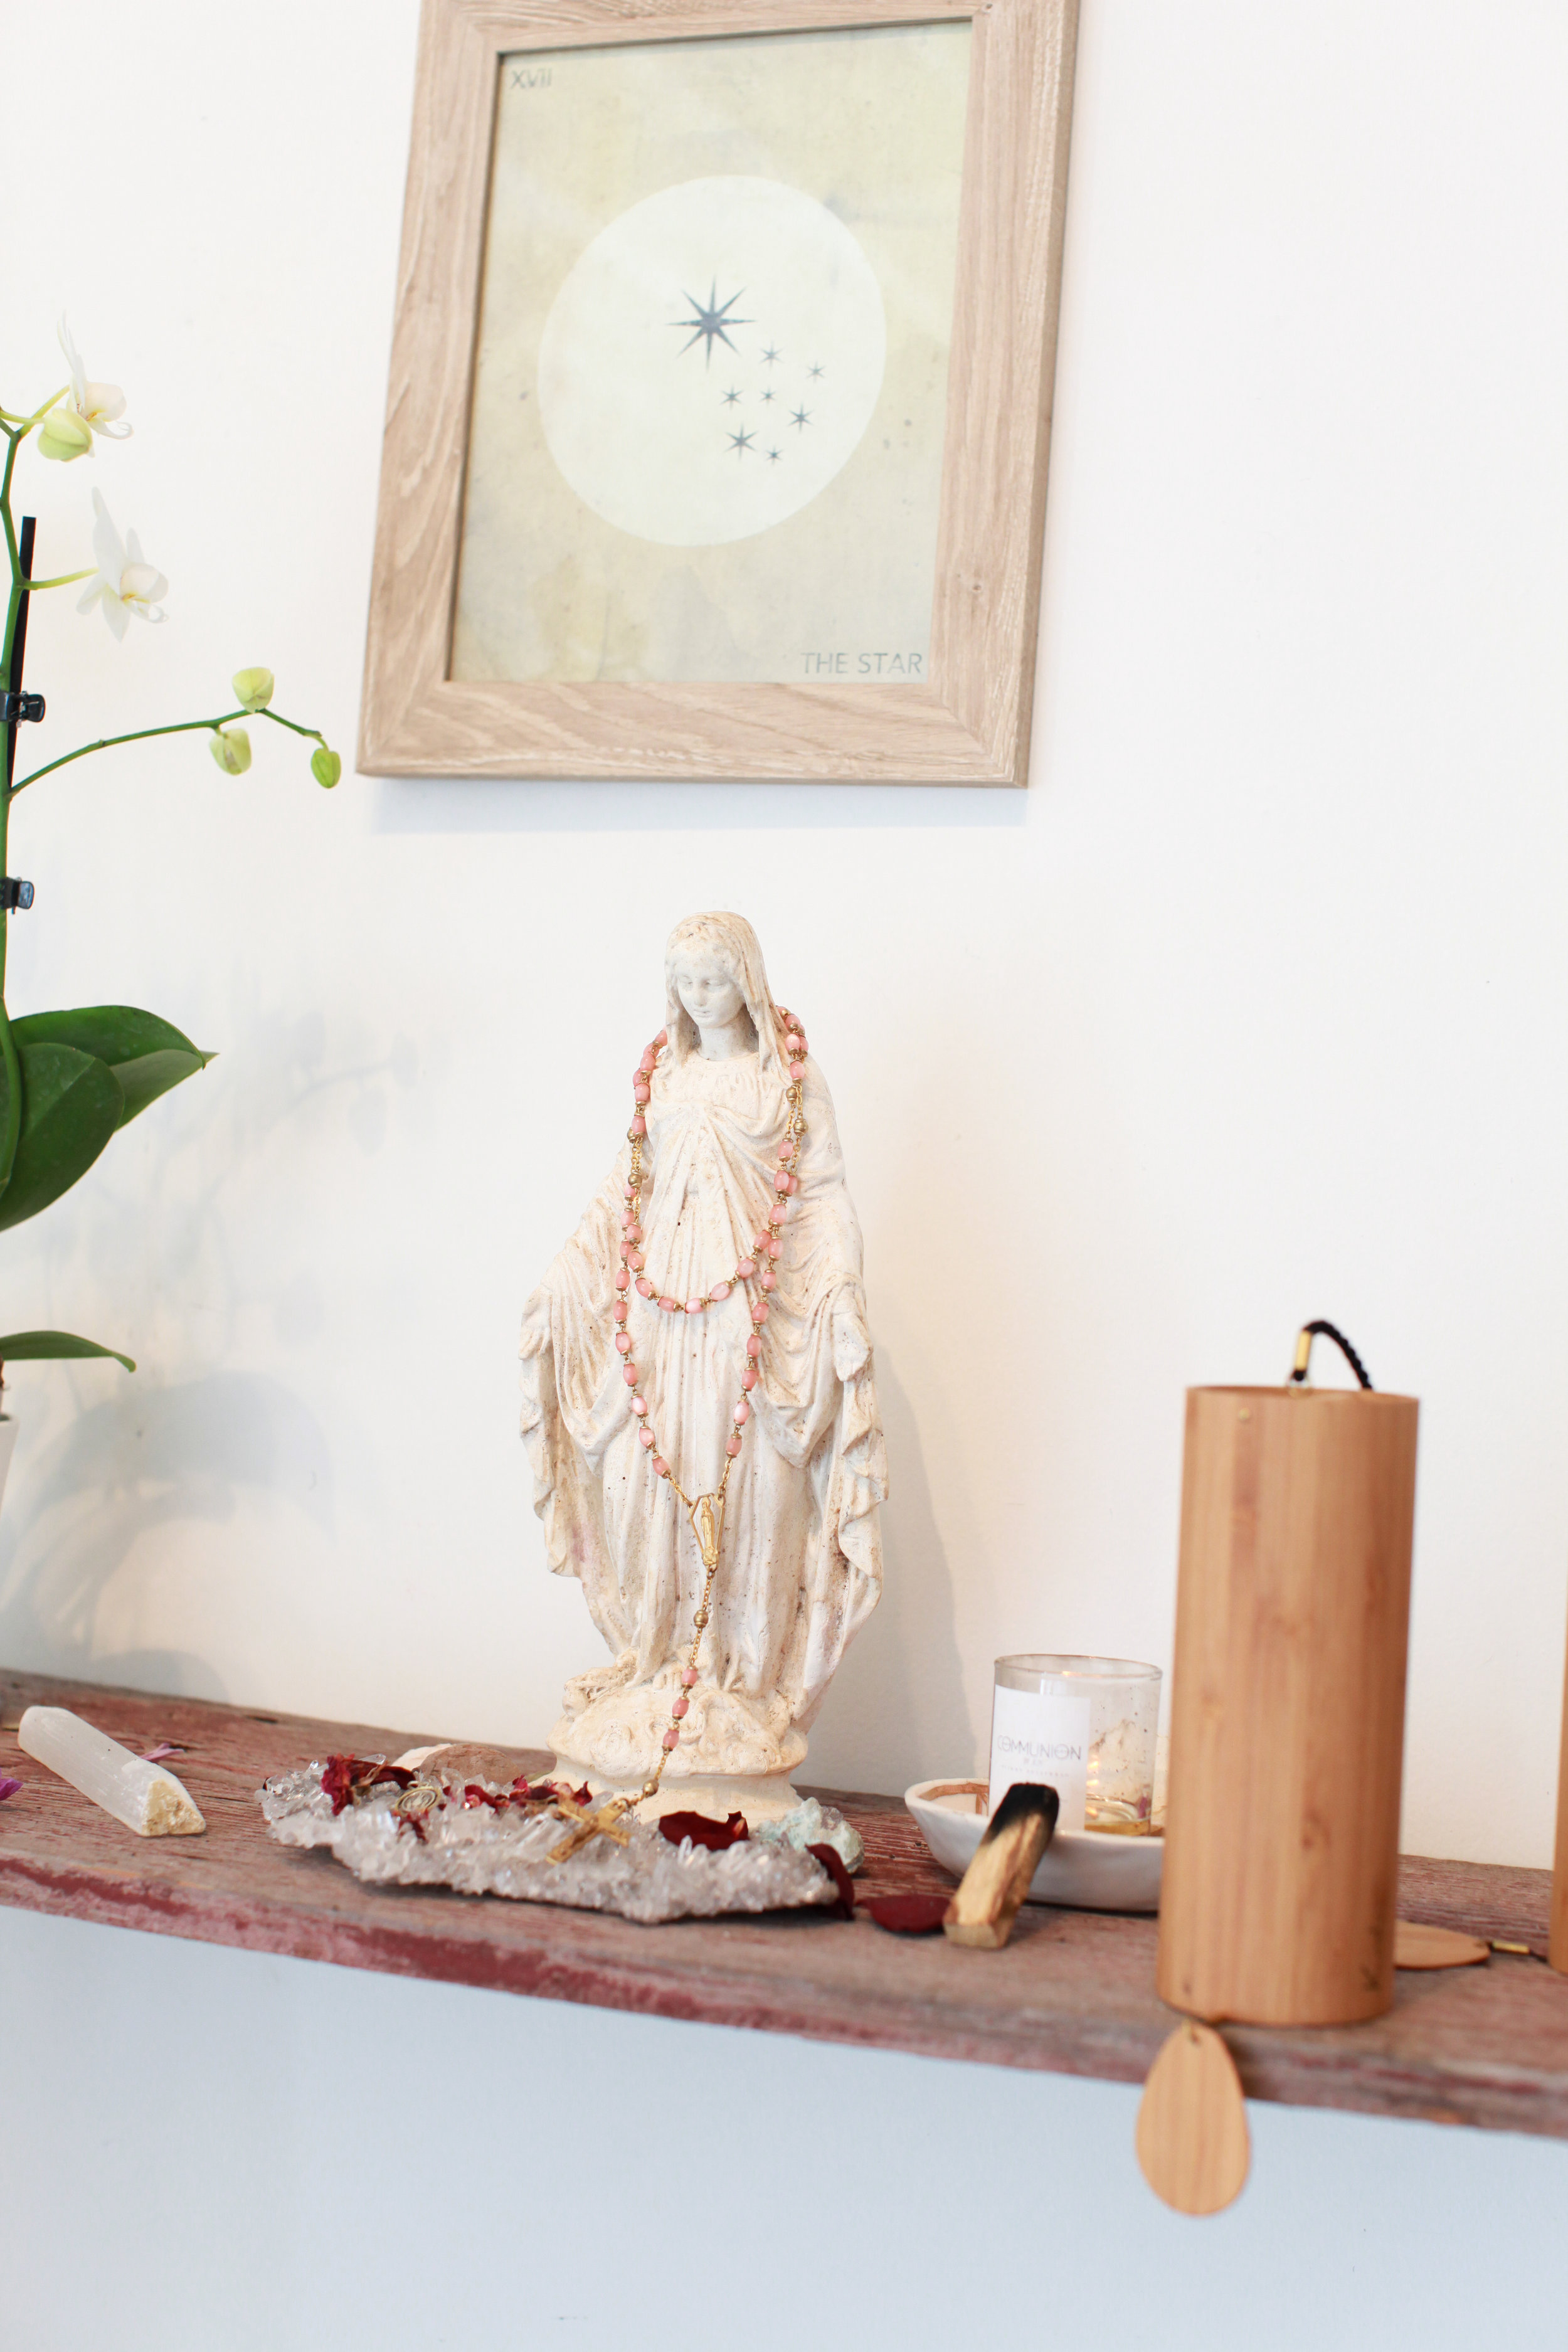 Communion by Joy Boutique in Culver City | Spiritual Jewelry in LA | Dainty Jewelry